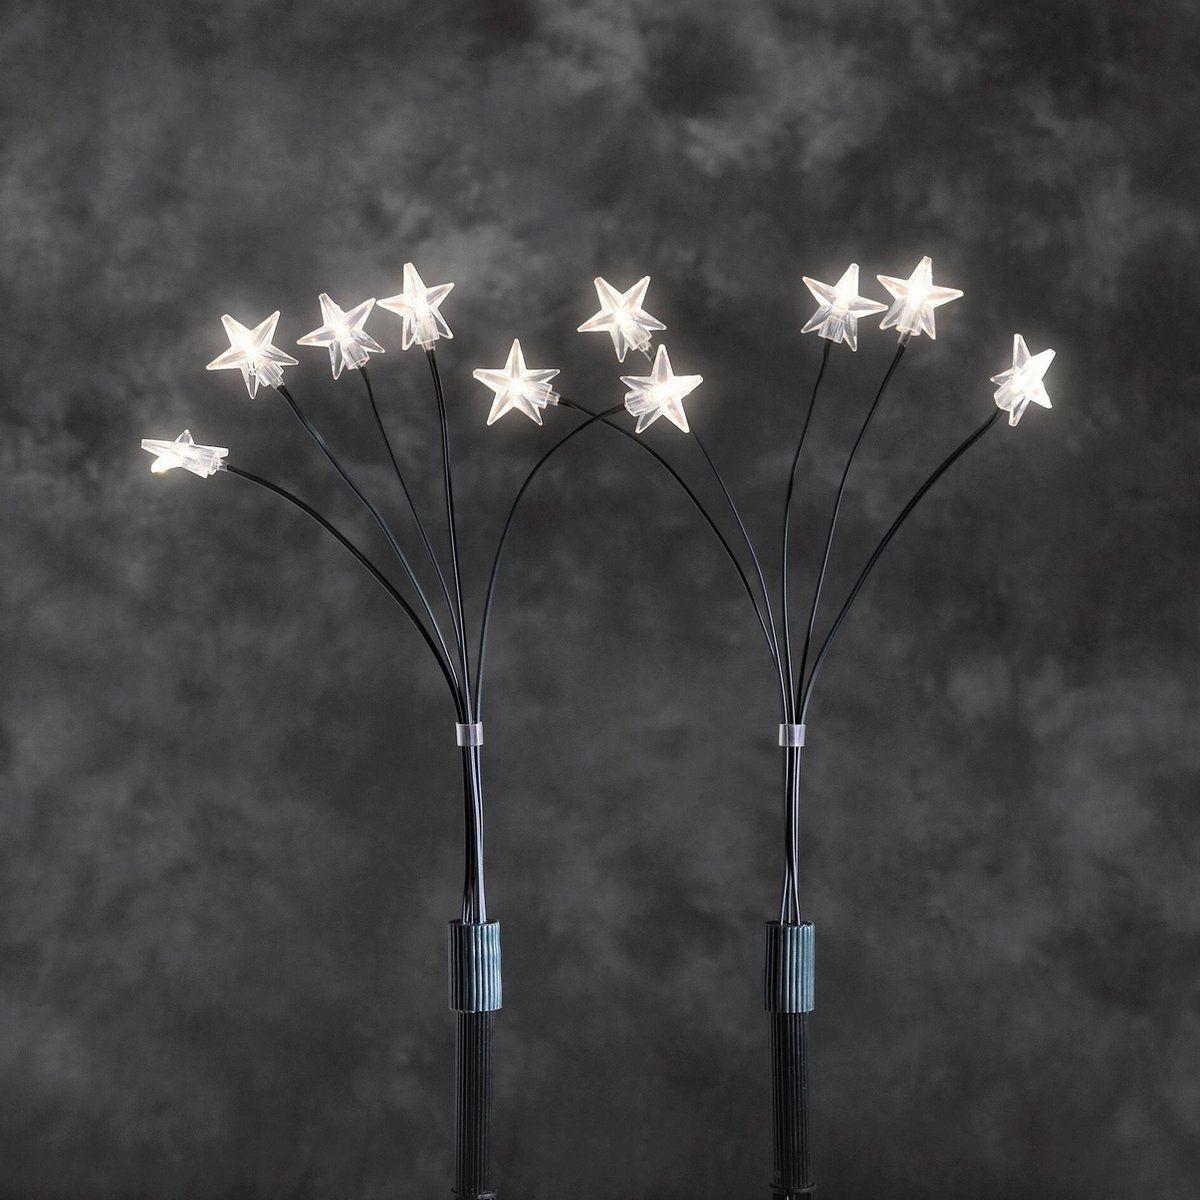 Konstsmide 4053 100 Set Van 5 Prikstokken Met Lichtsterren 25 Led Lampen Ster Led Led Led Lamp Lampen